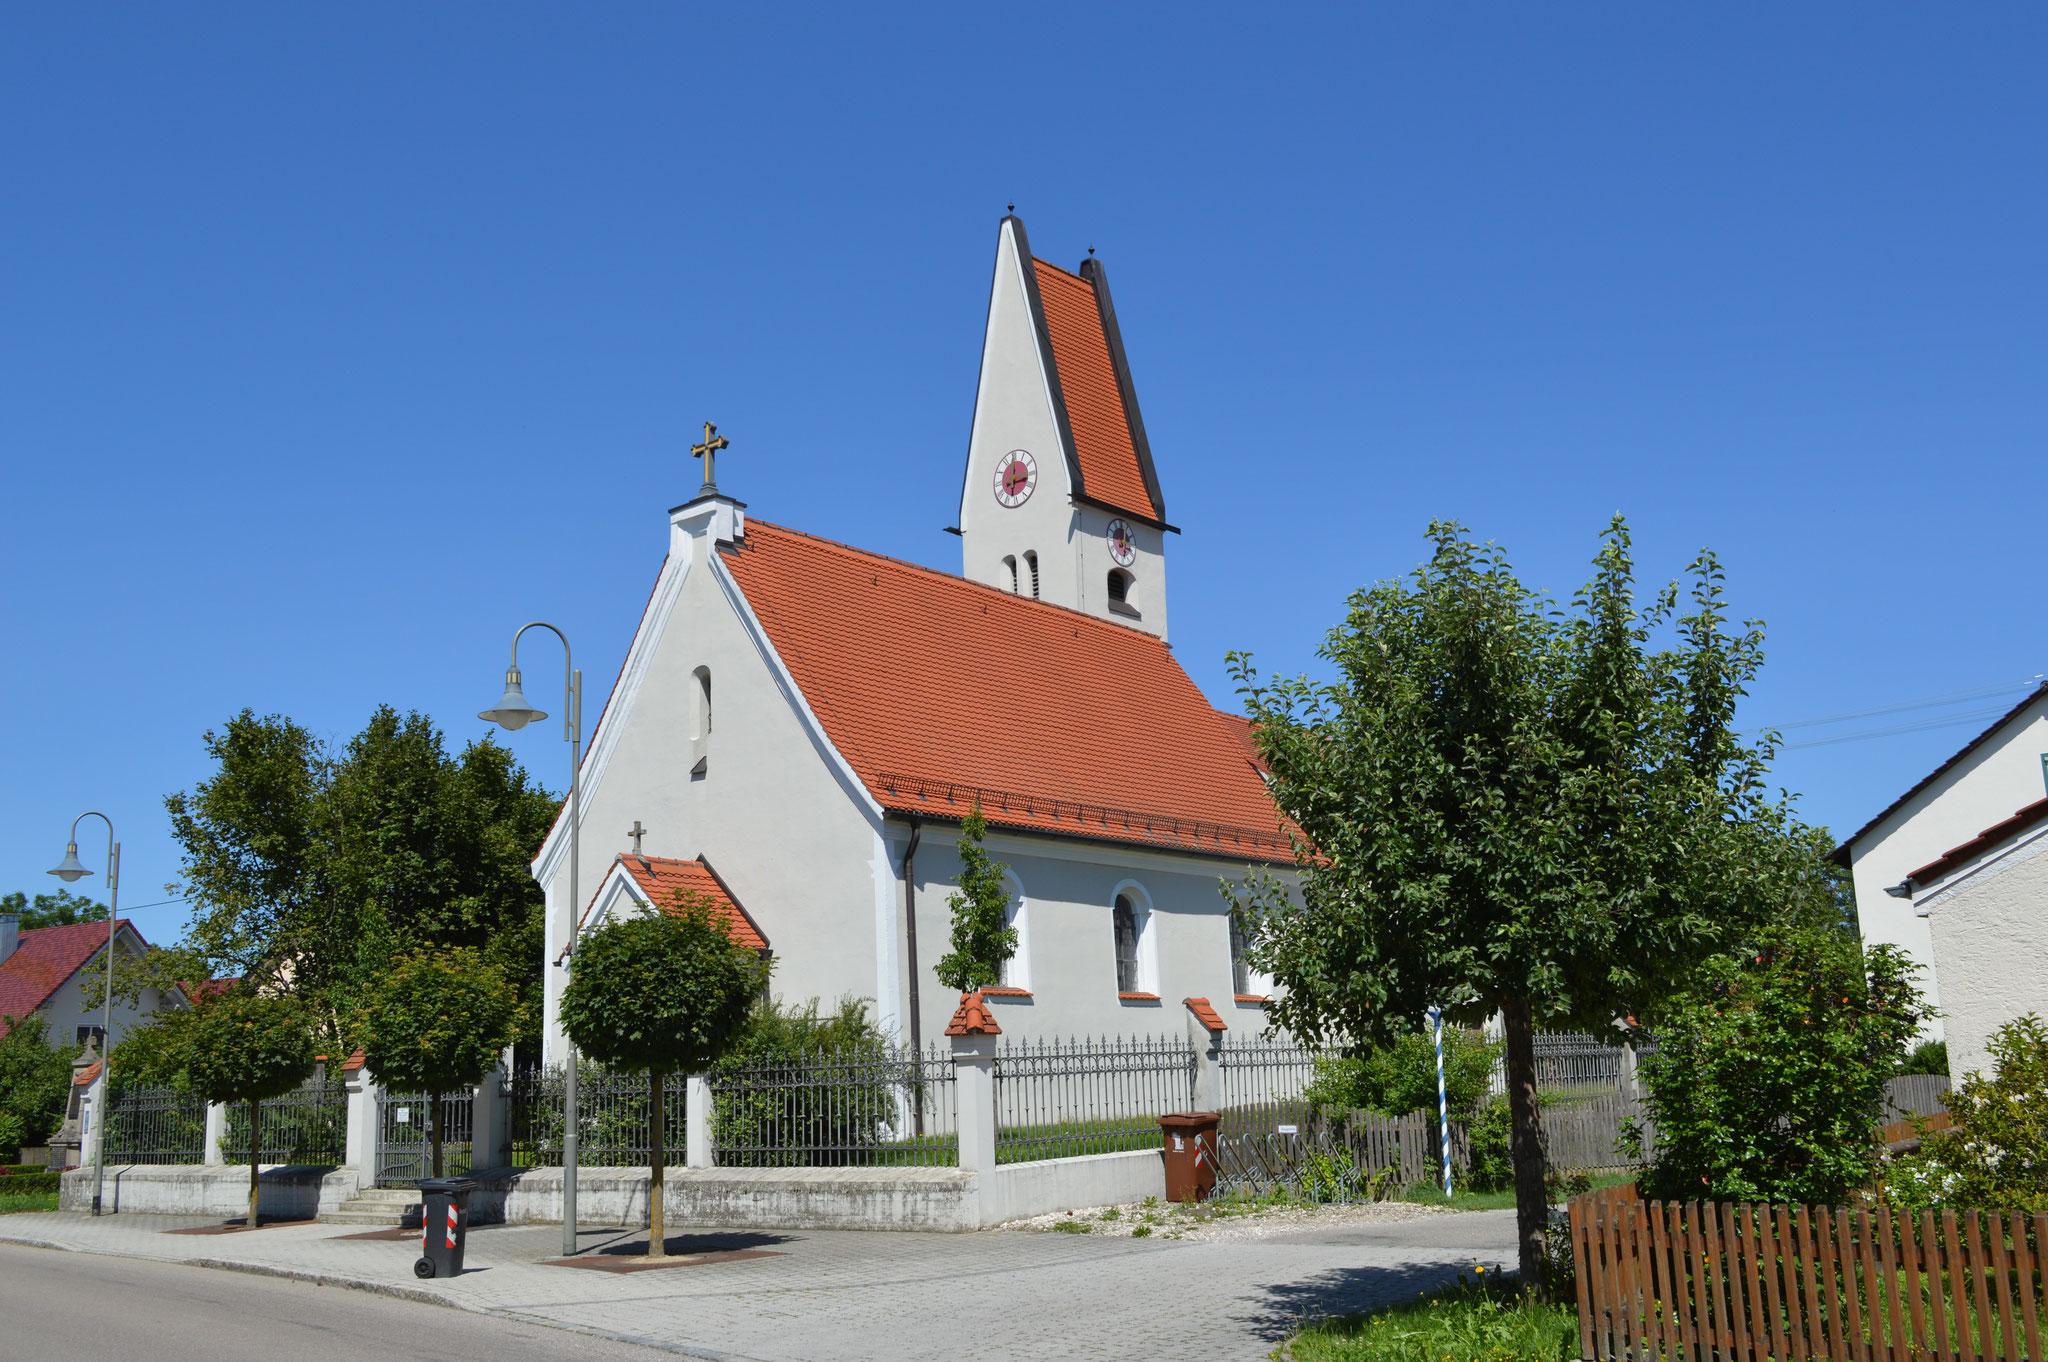 St. Michael Ostendorf